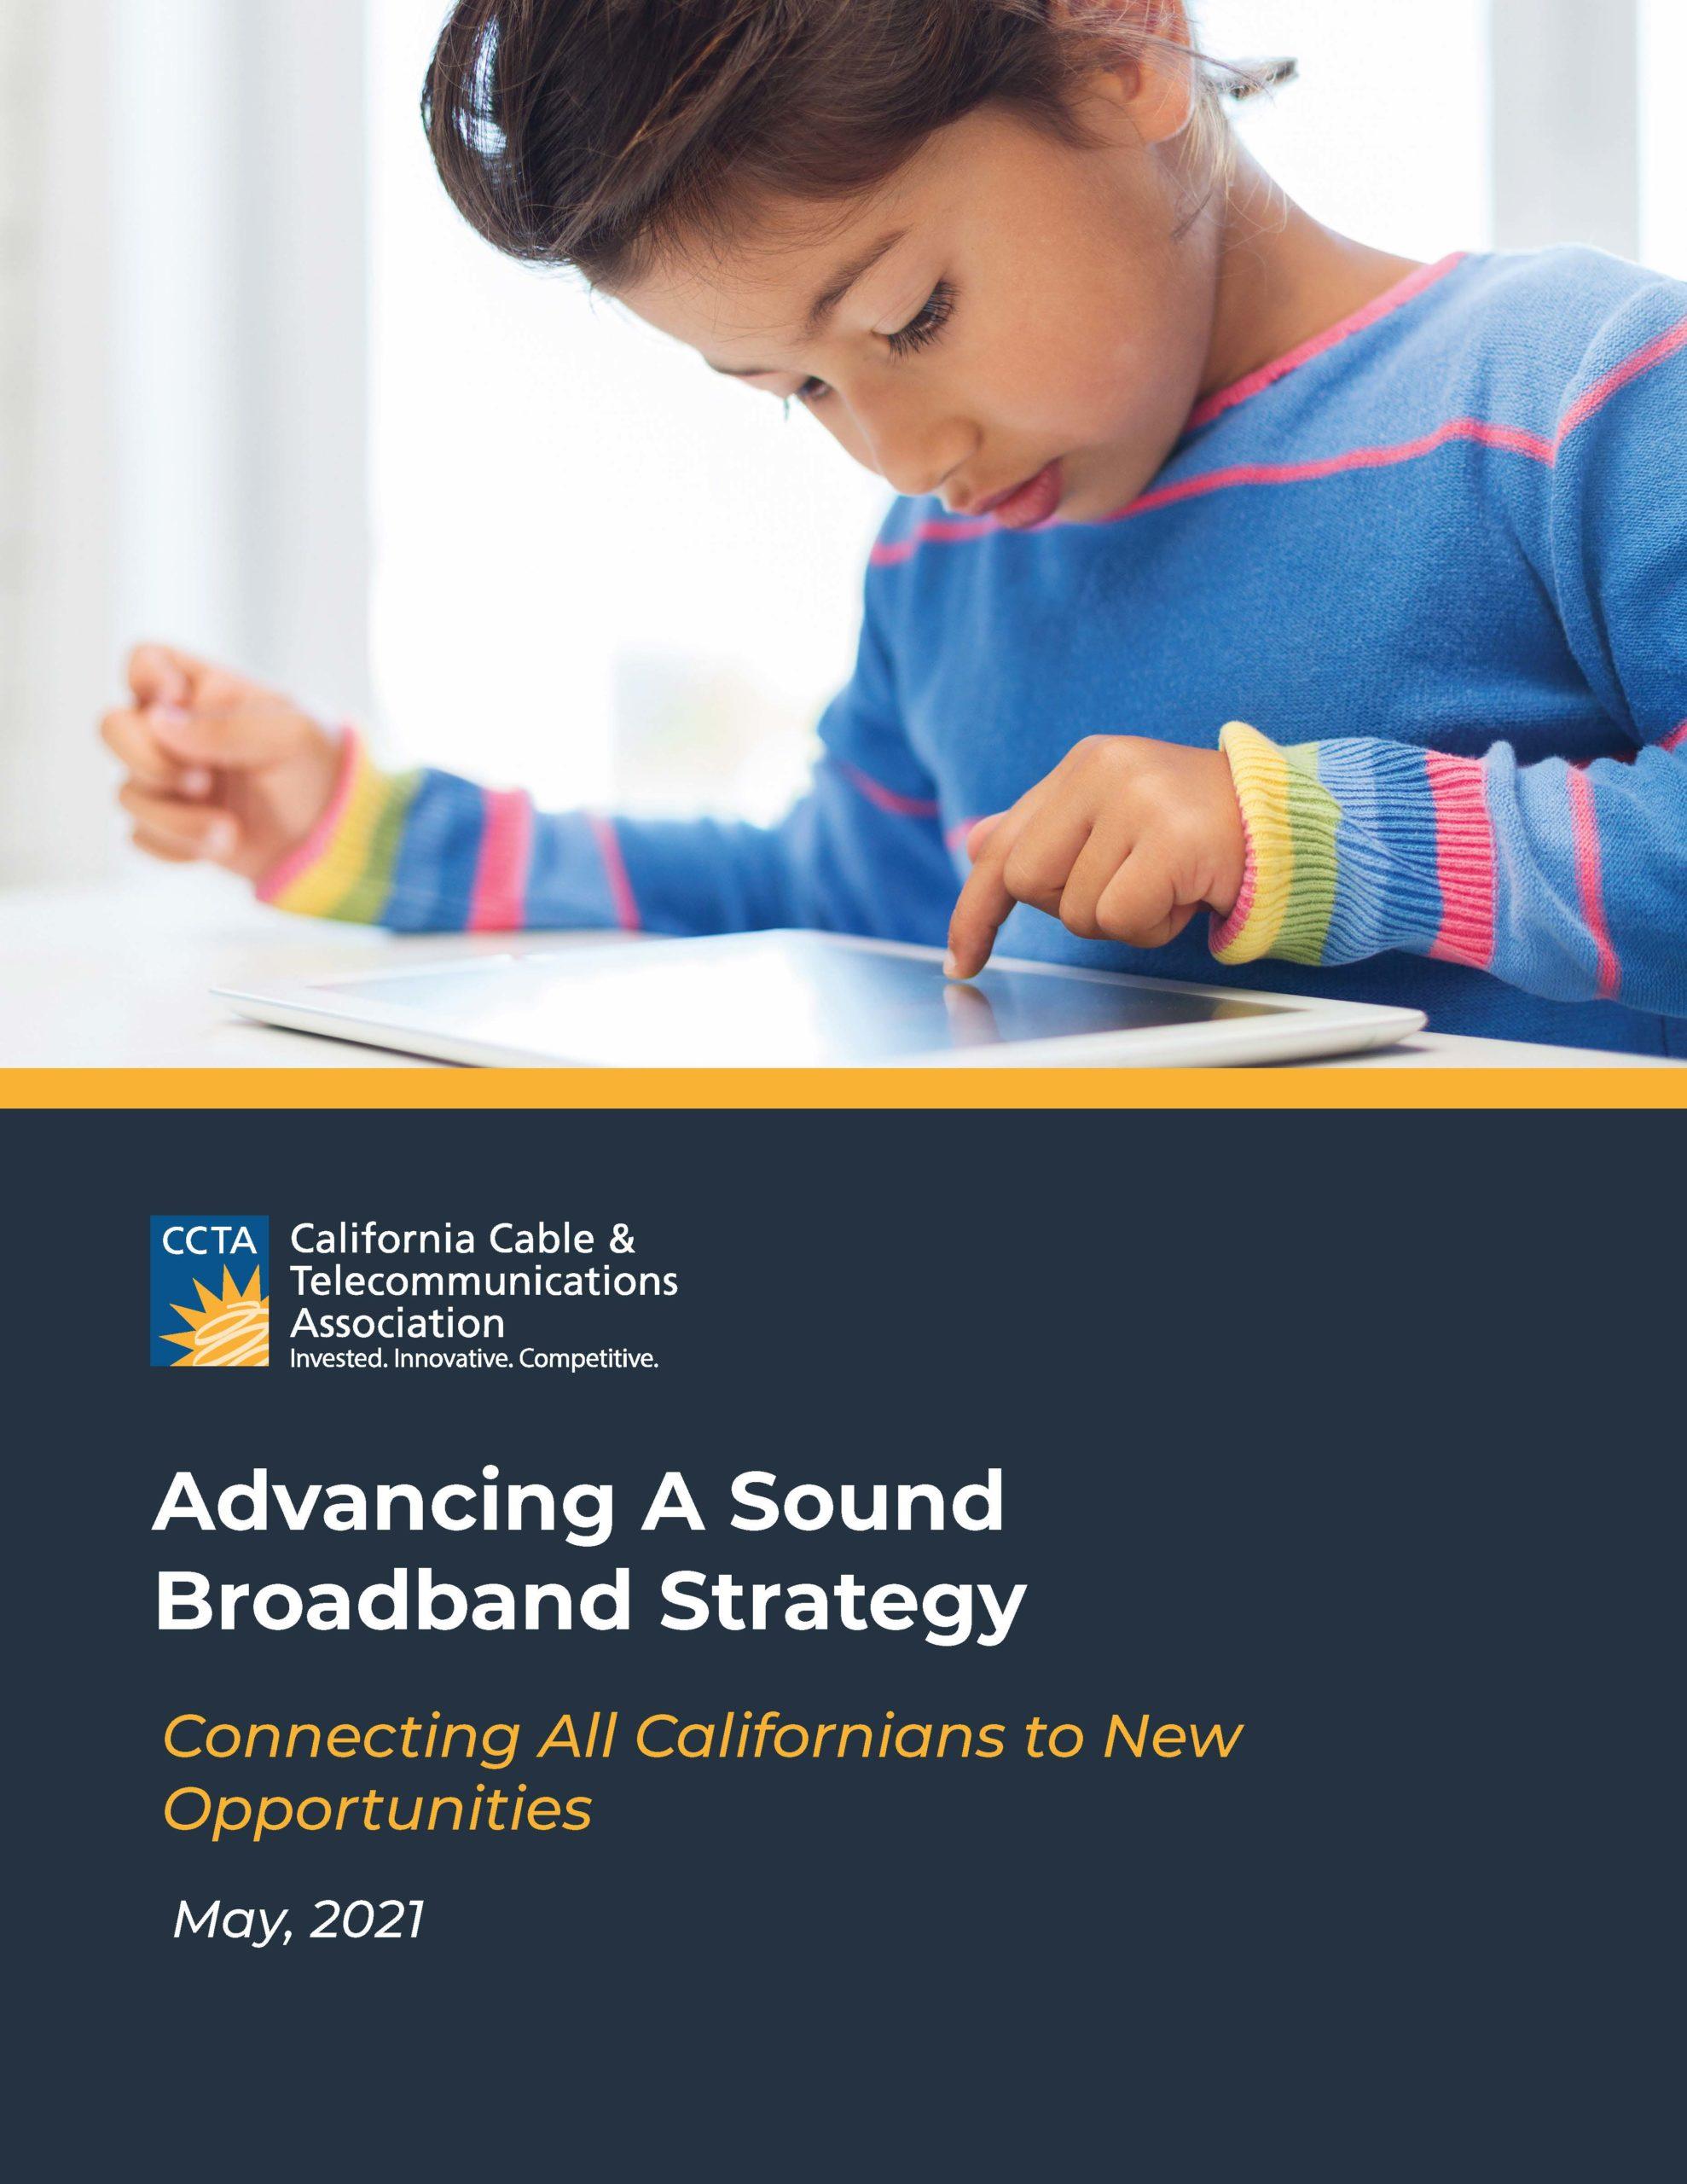 CCTA Advancing A Sound Broadband Strategy Report_Final_Page_1